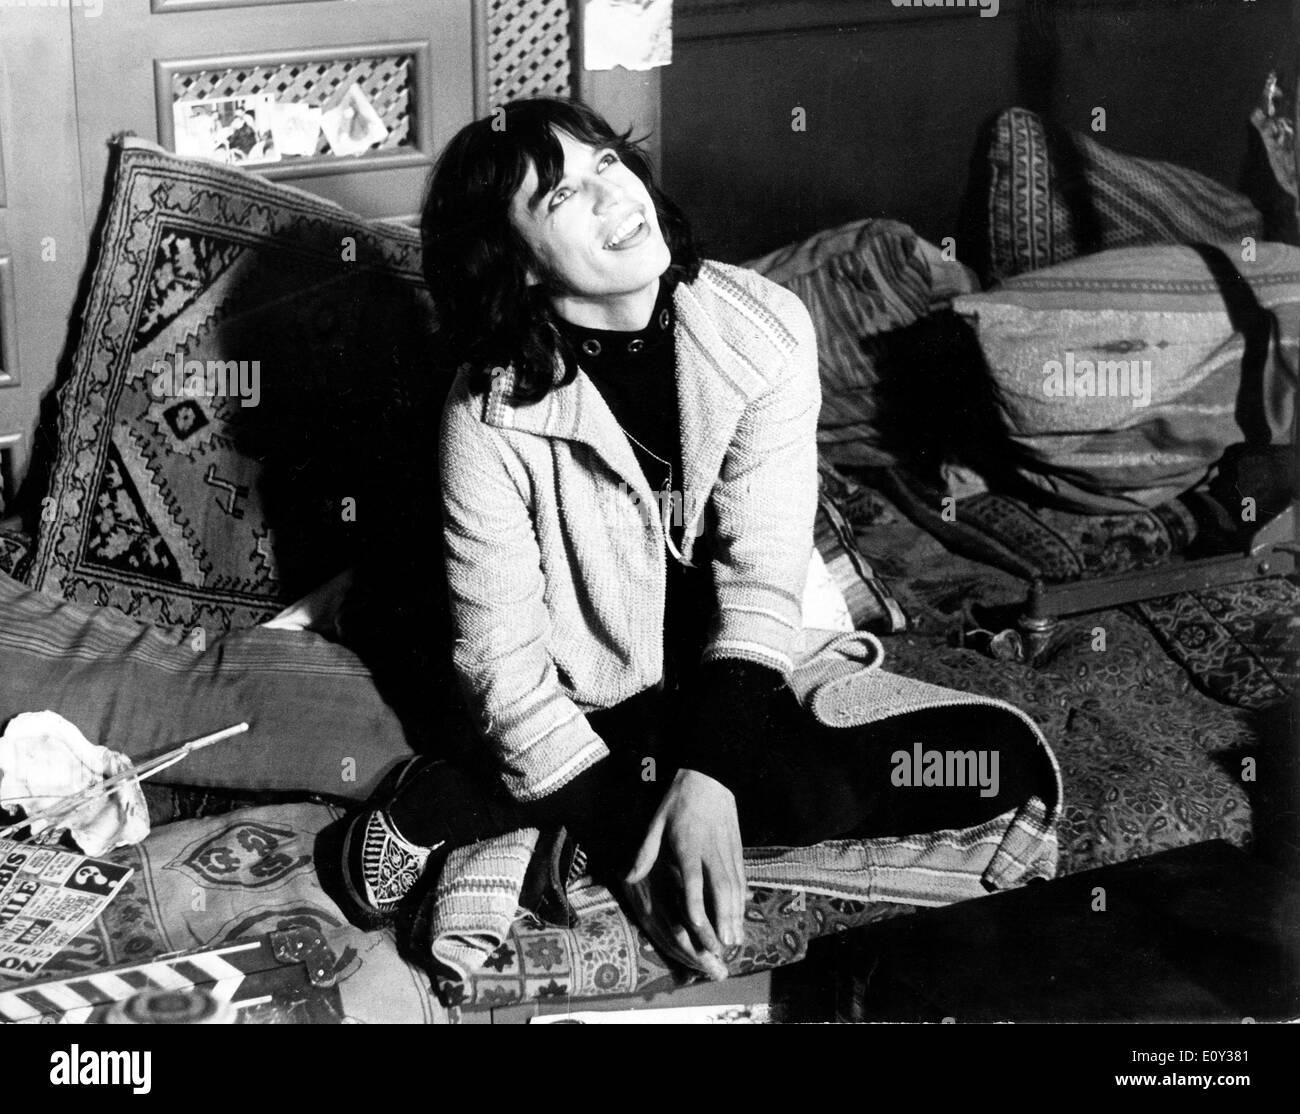 Singer Mick Jagger films, 'Performance' - Stock Image